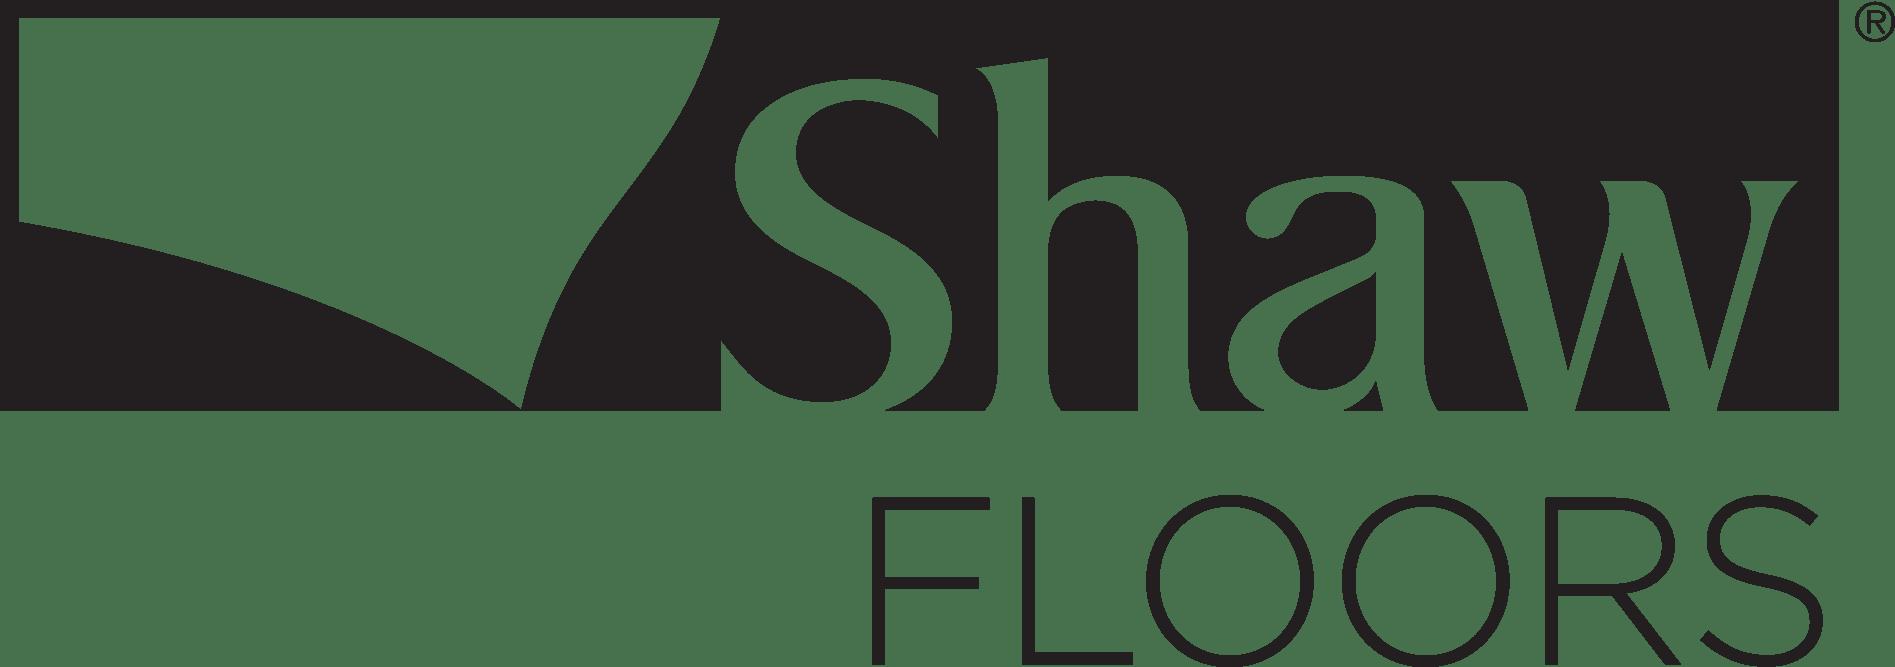 Shaw Floors dealer in Tacoma WA